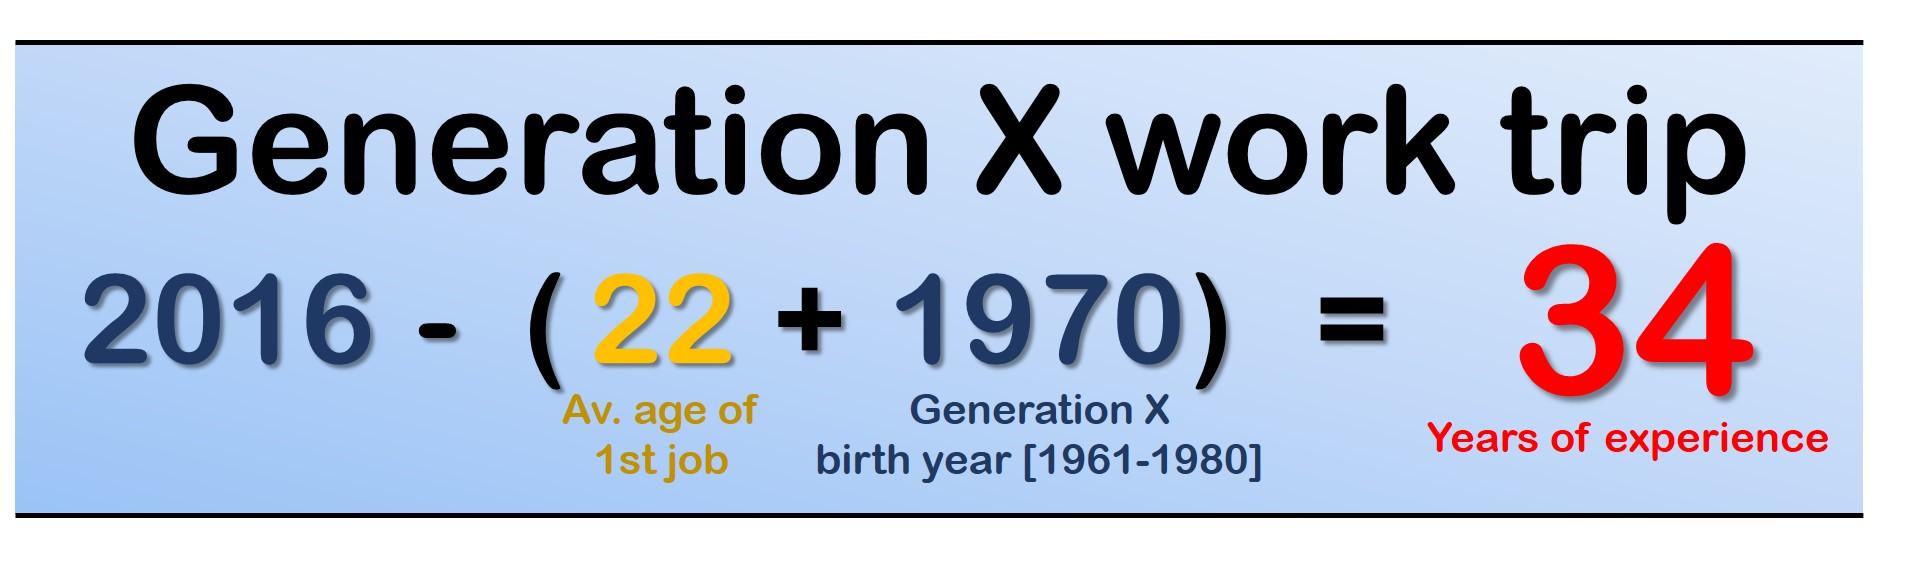 workplace generation wars sogetilabs generation x work trip